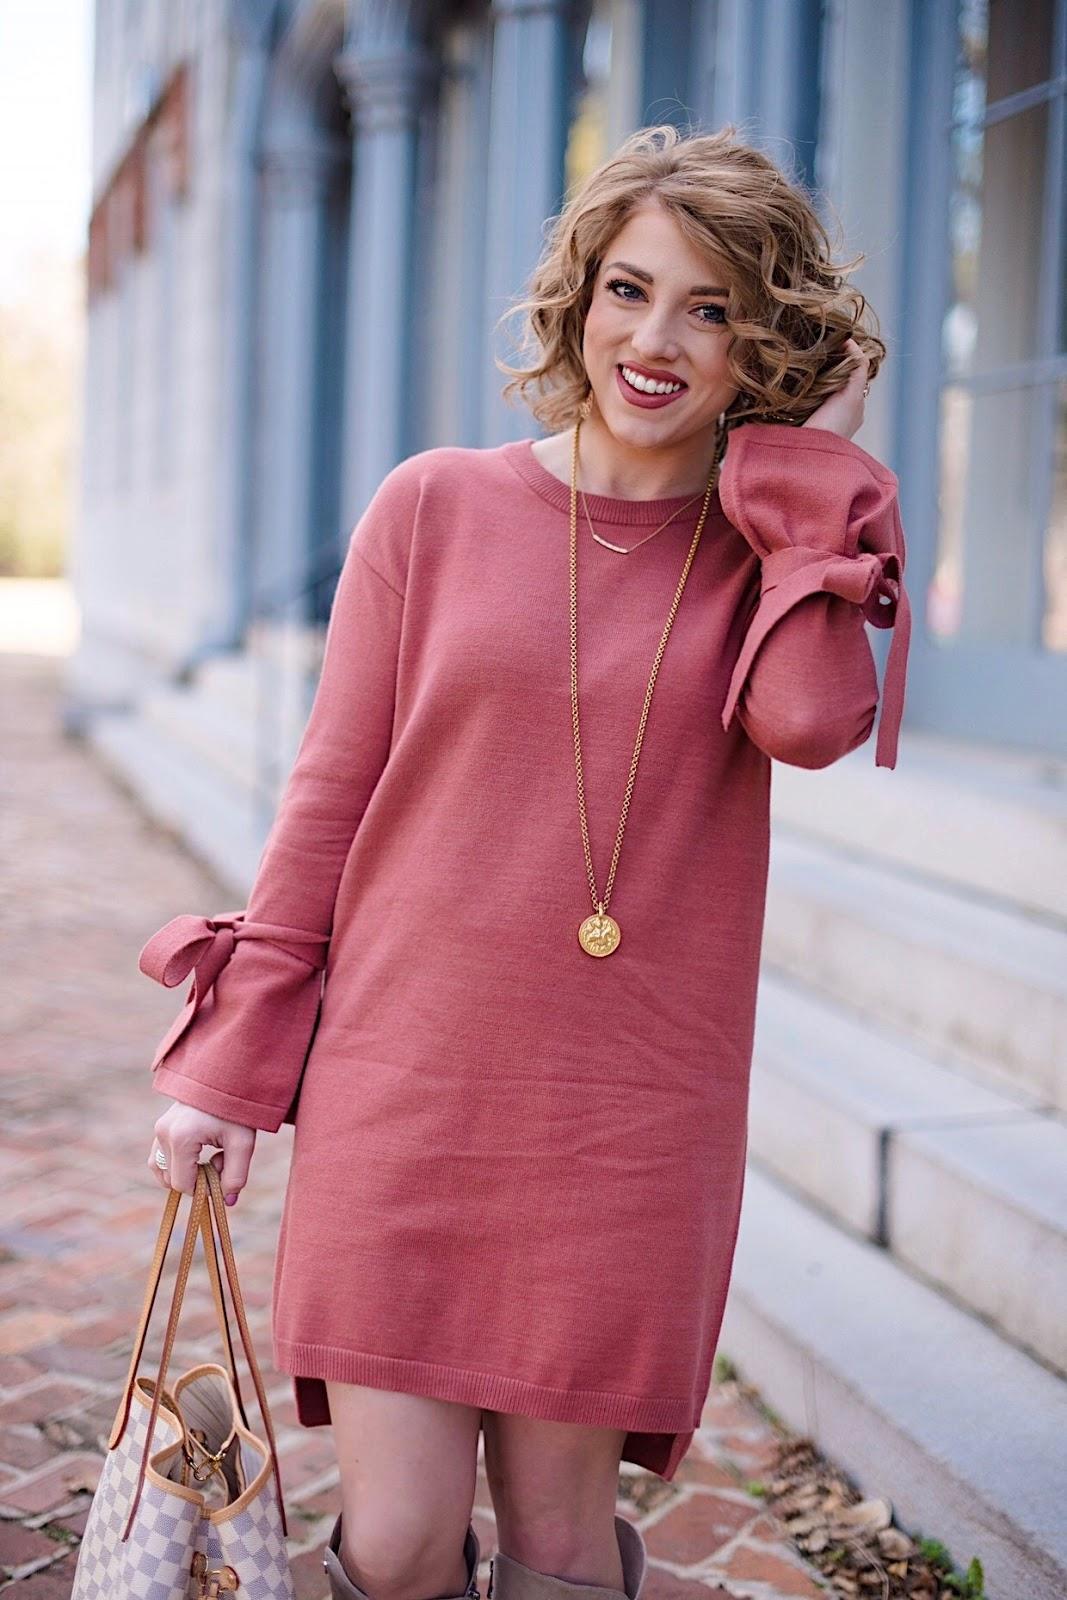 Tied Sleeve Sweater Dress - Something Delightful Blog